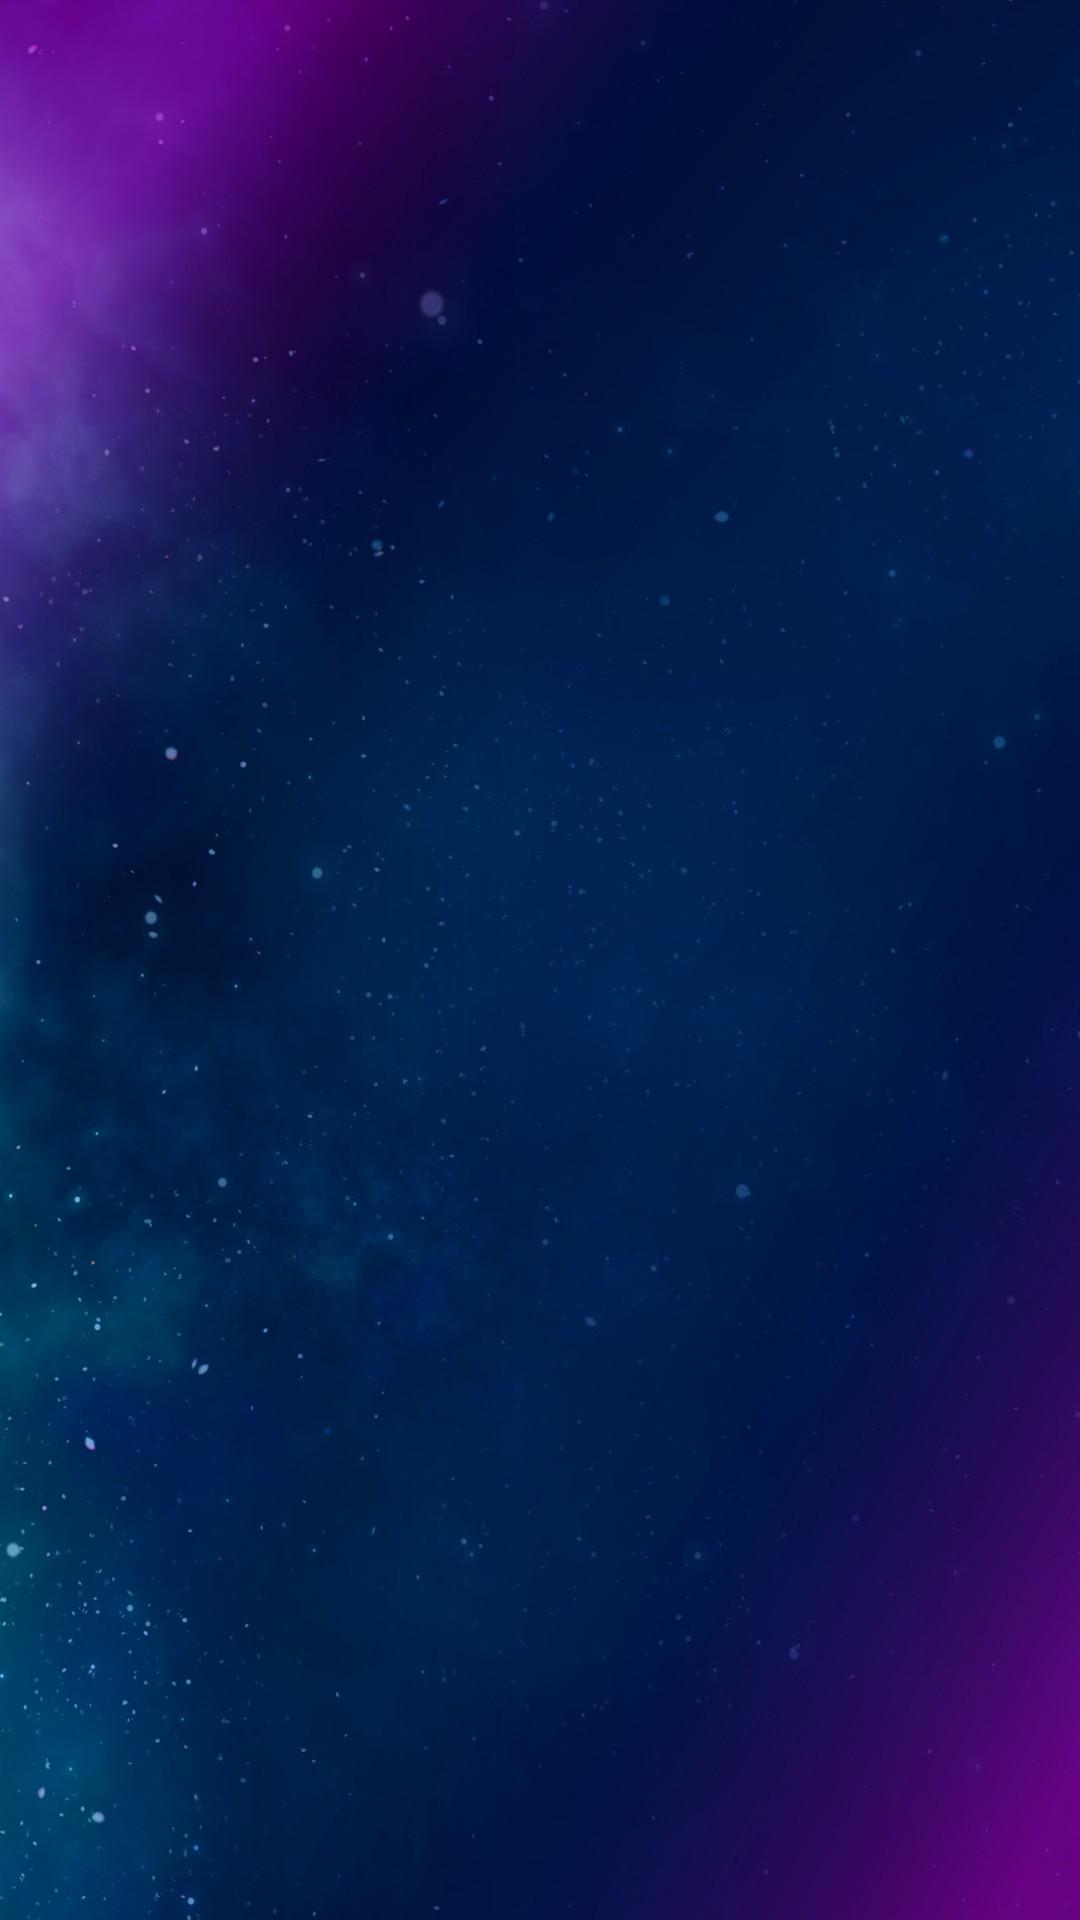 Free Lubuntu Bionic Beaver phone wallpaper by ladycomet1